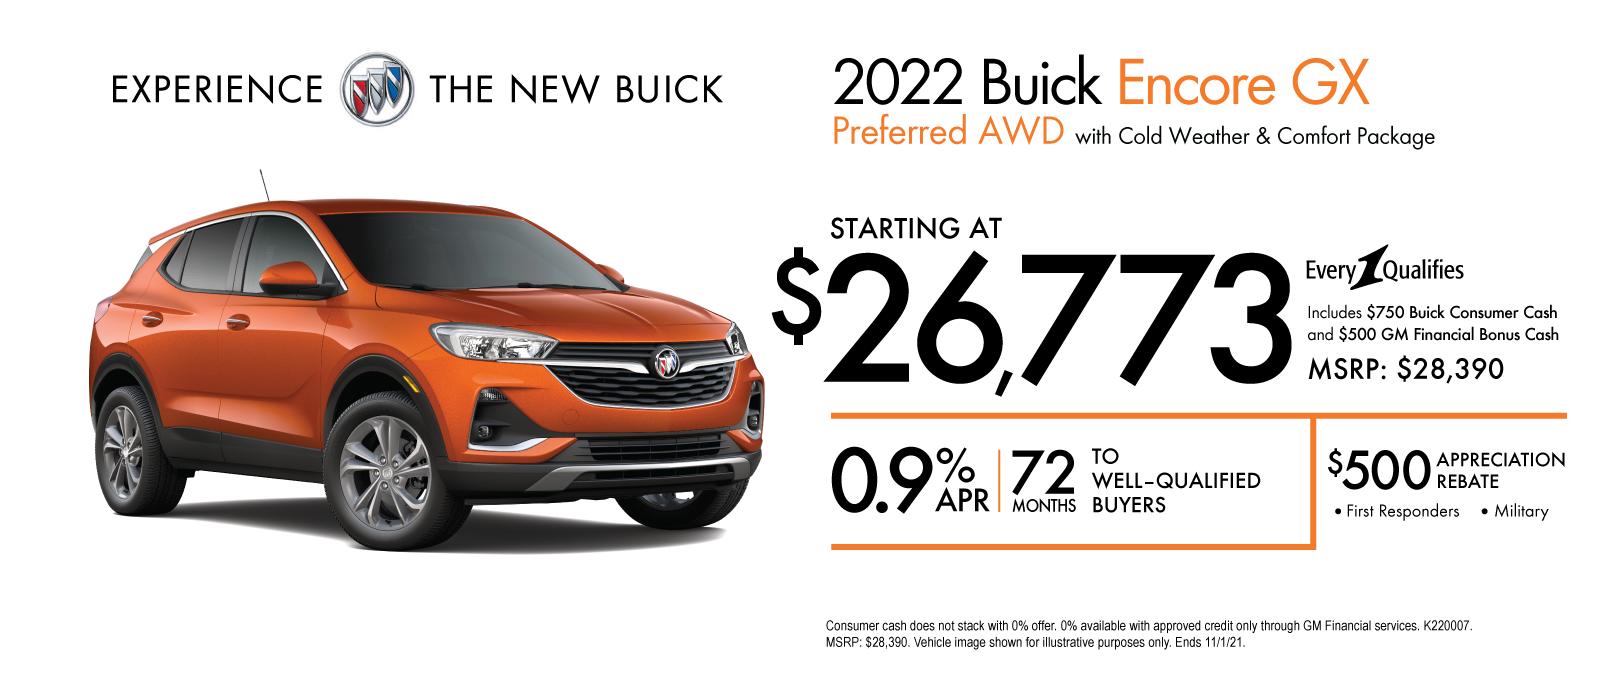 October-2021-Buick-CS-Slides_2022-Buick-Encore-GX-BUY